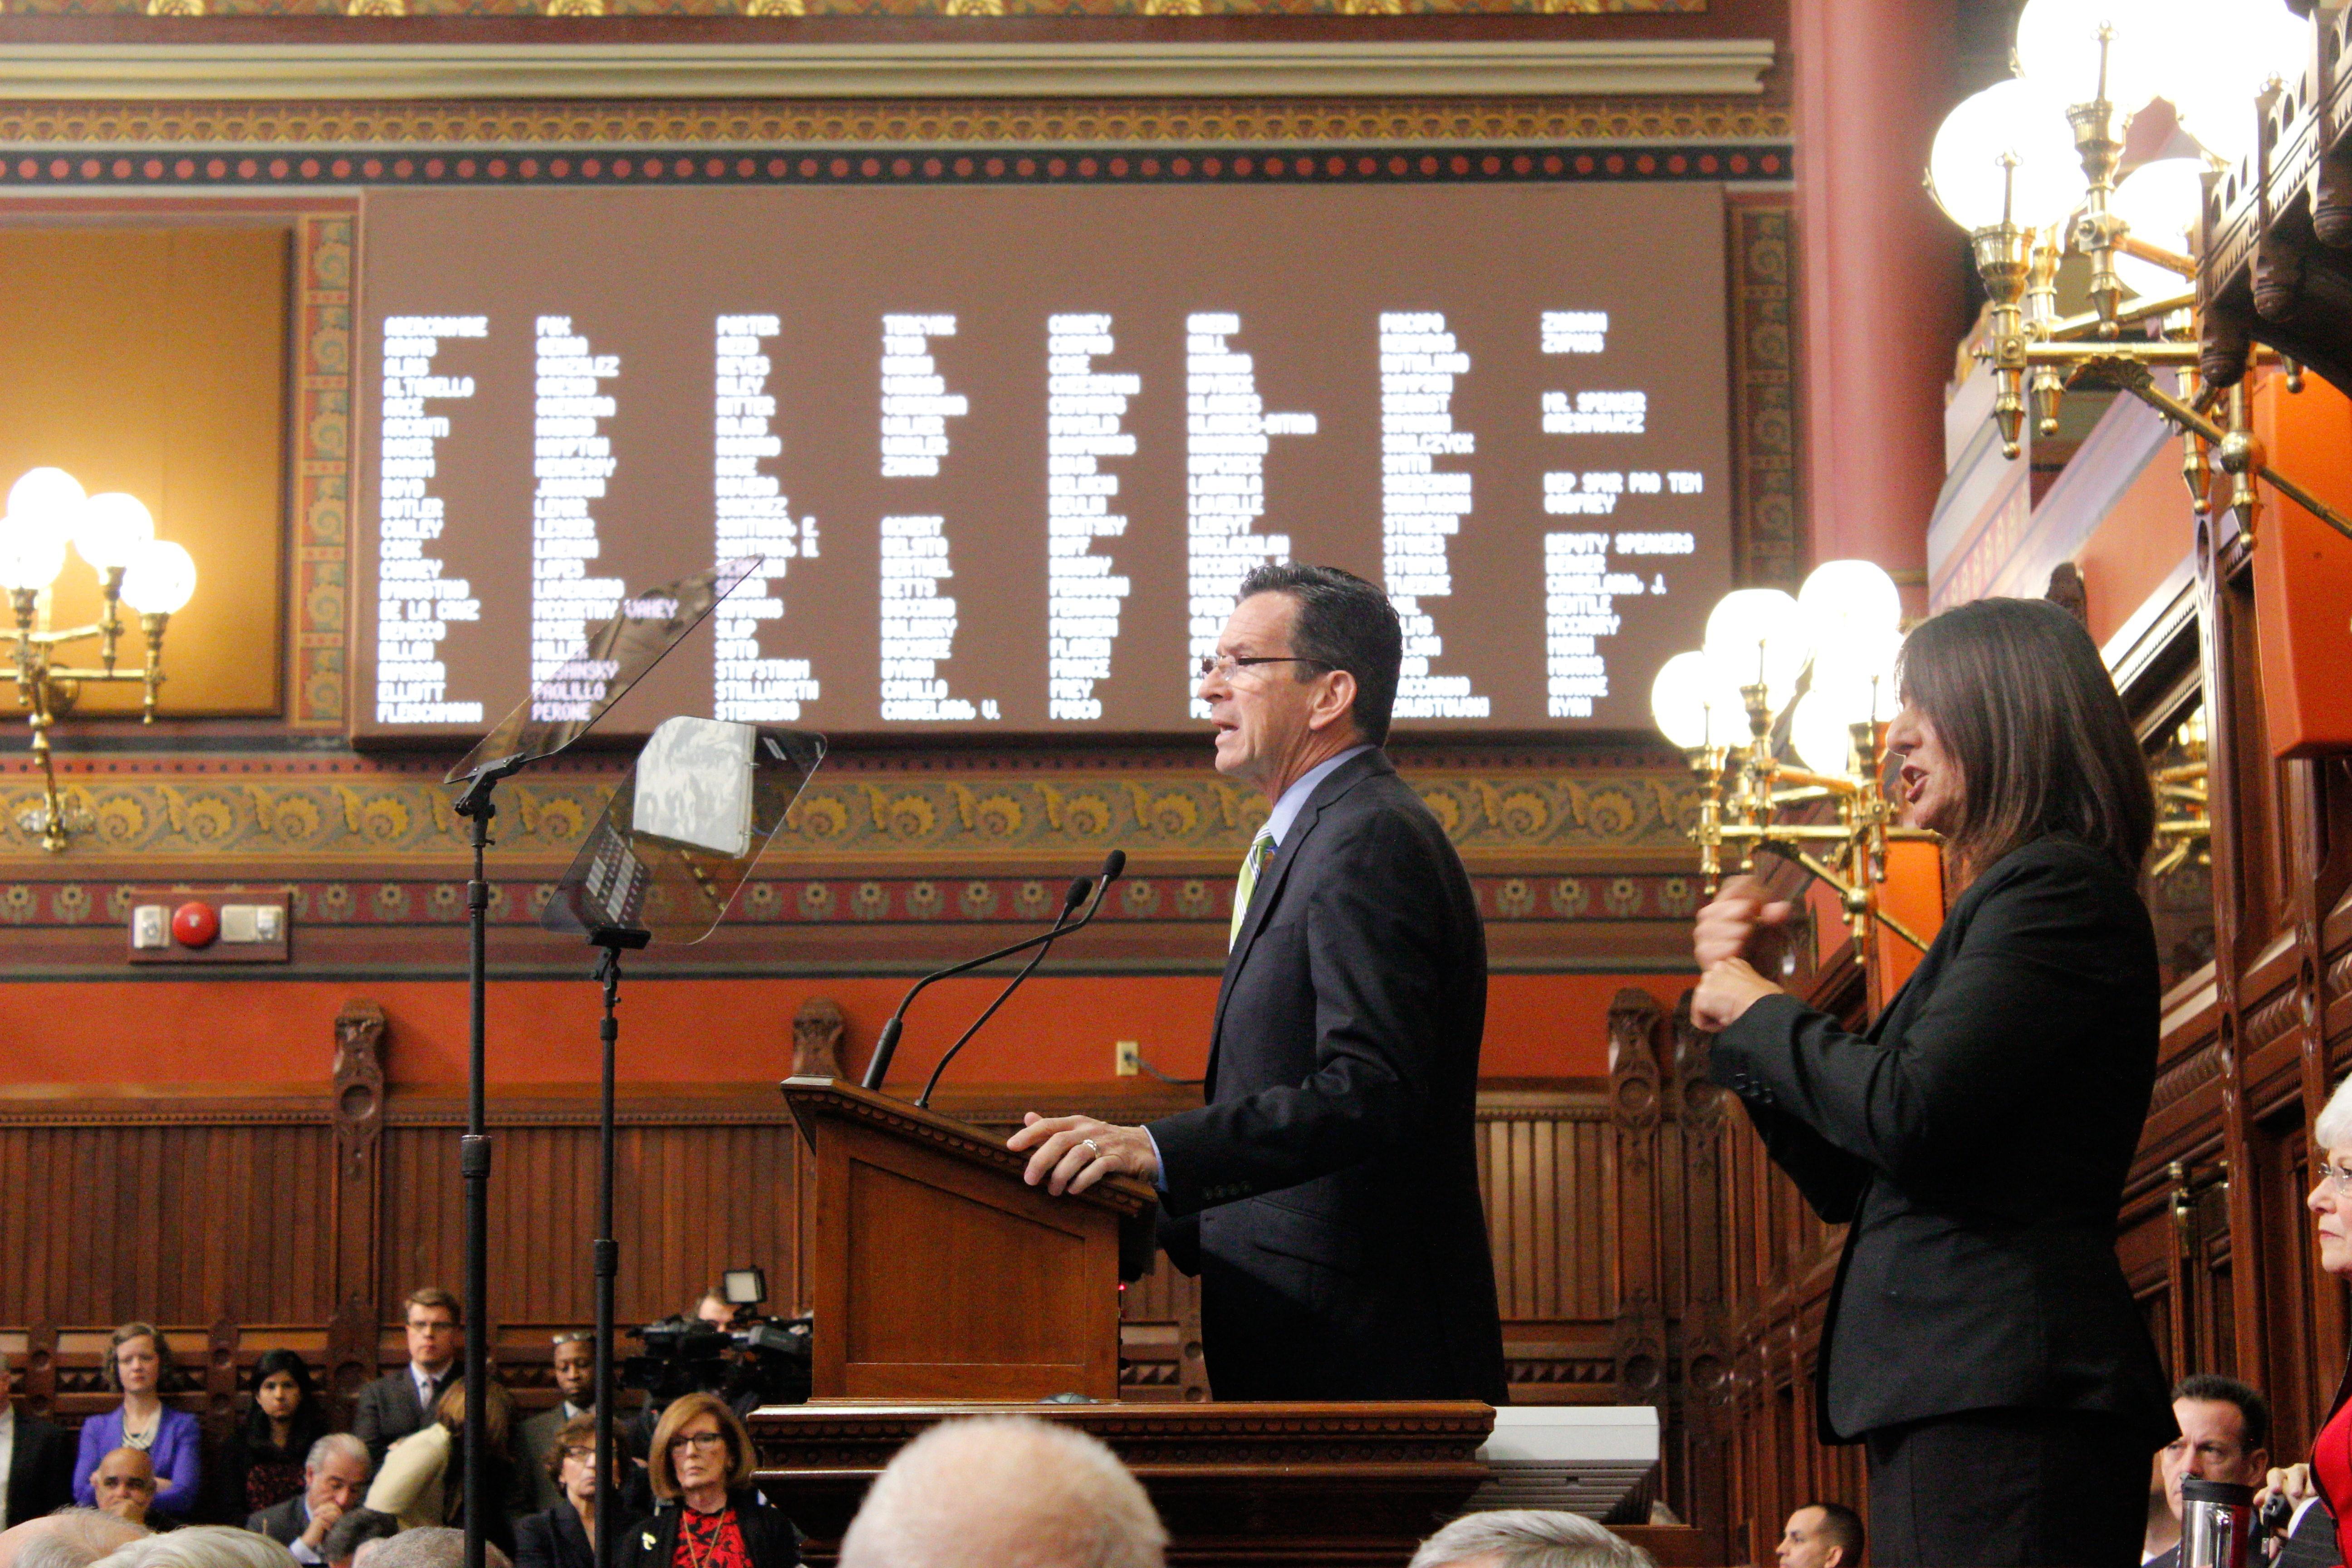 Amid cuts and concessions, Malloy promises progress